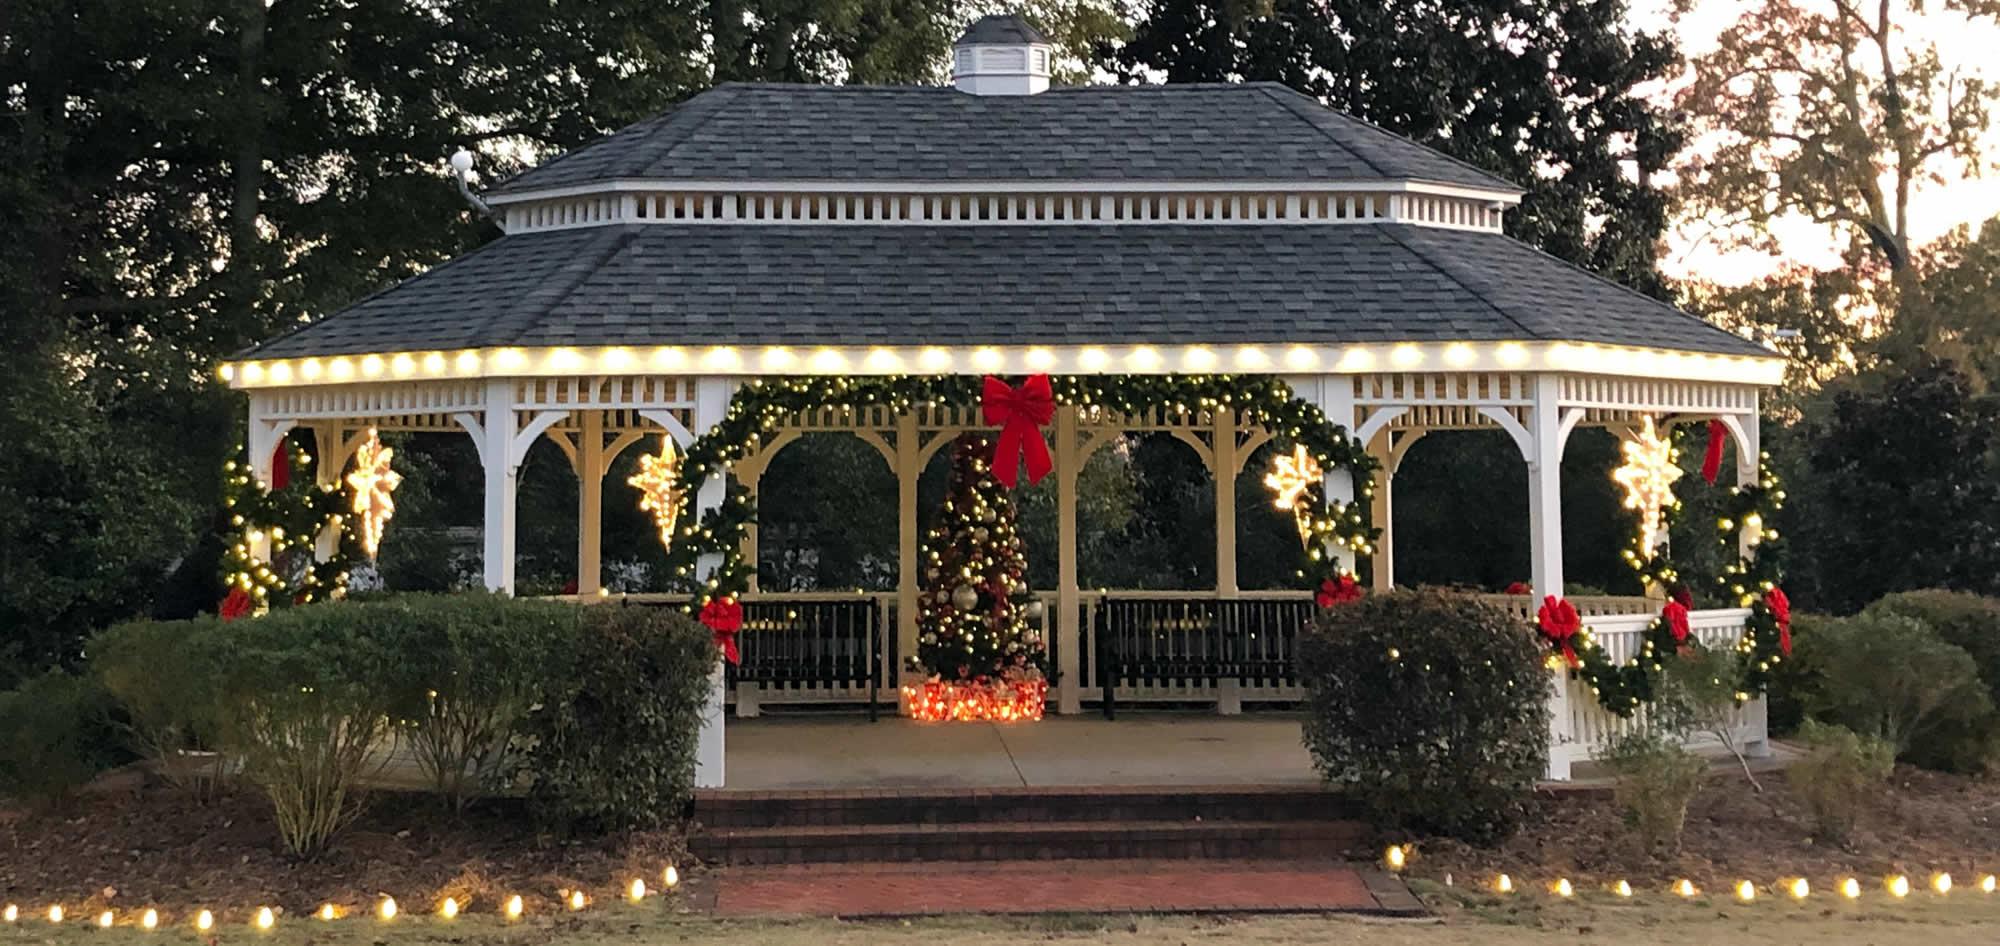 Outdoor Municipality Holiday Decor